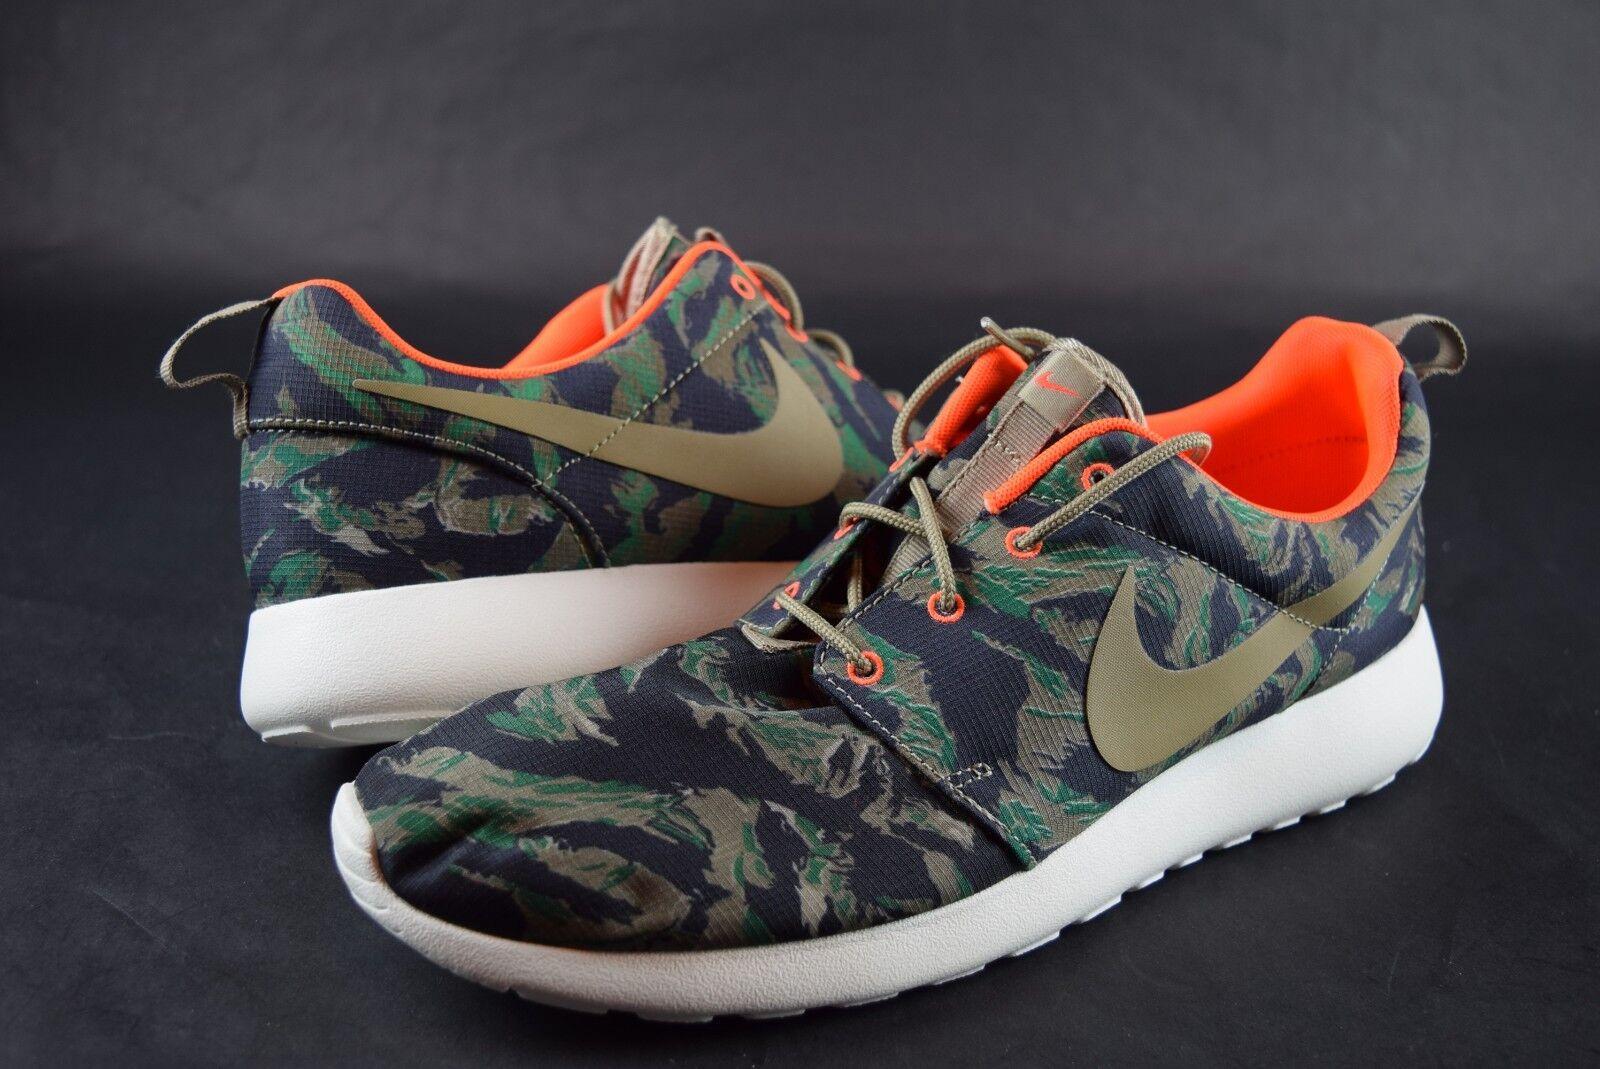 New Homme Nike Roshe Run Print 655206 203 SZ  Olive Seaweed  chaussures  sneakers